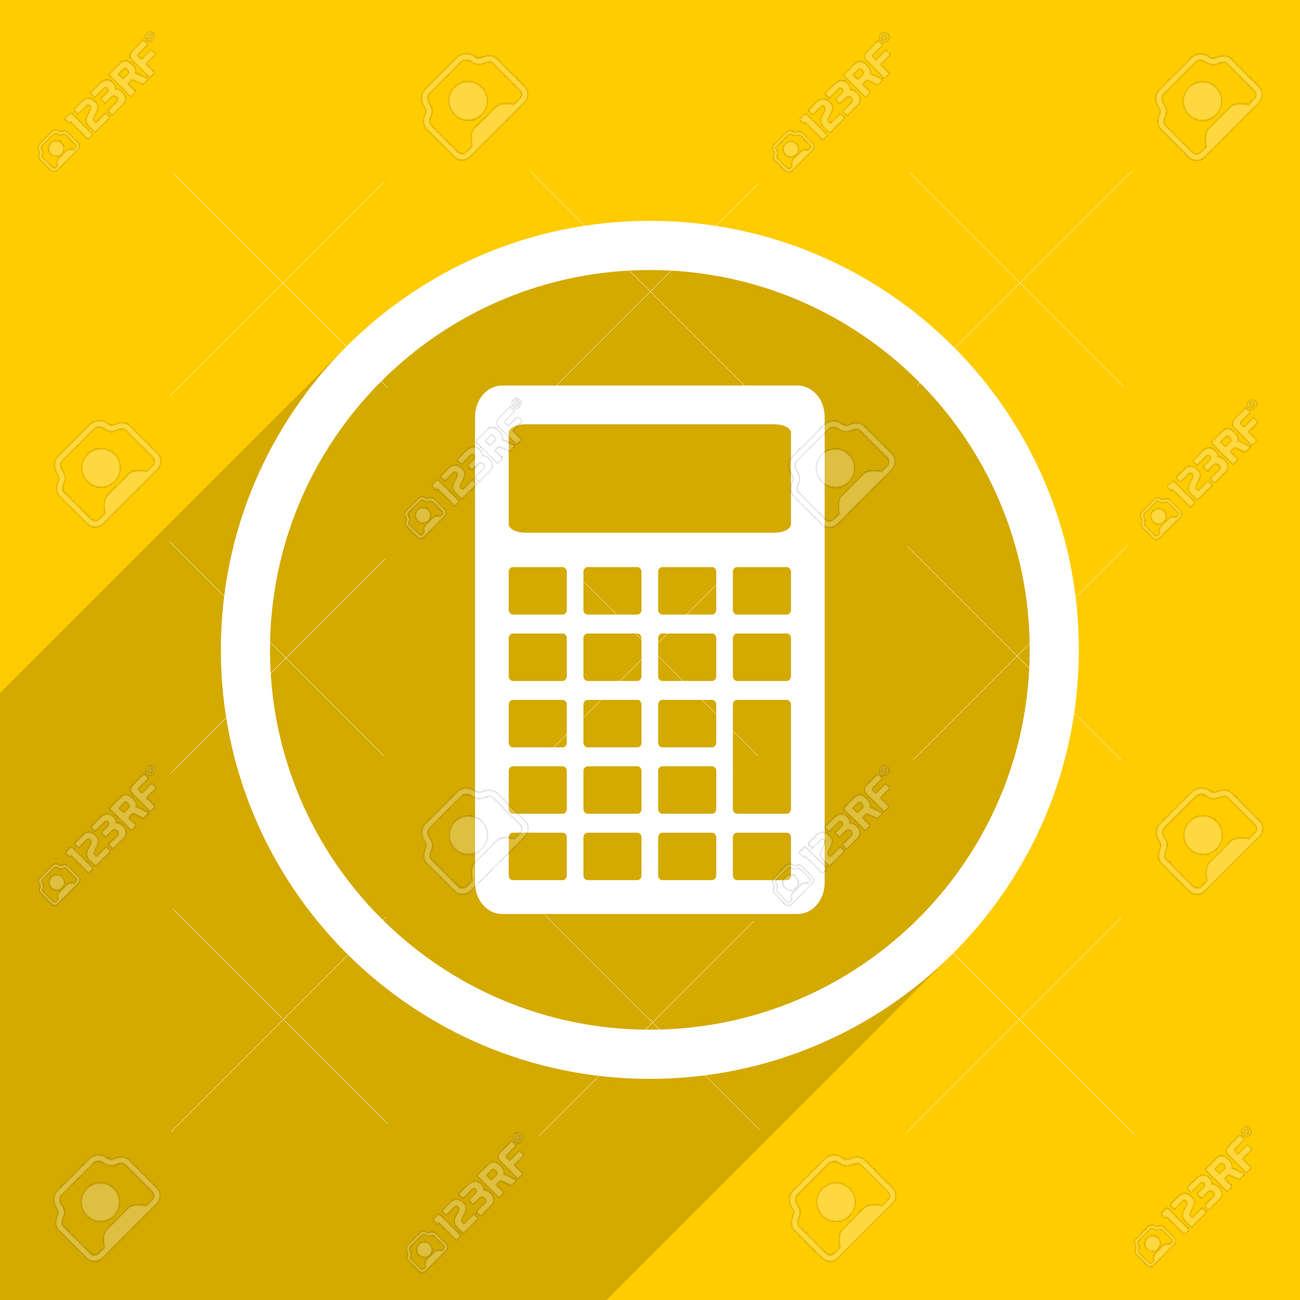 yellow flat design calculator